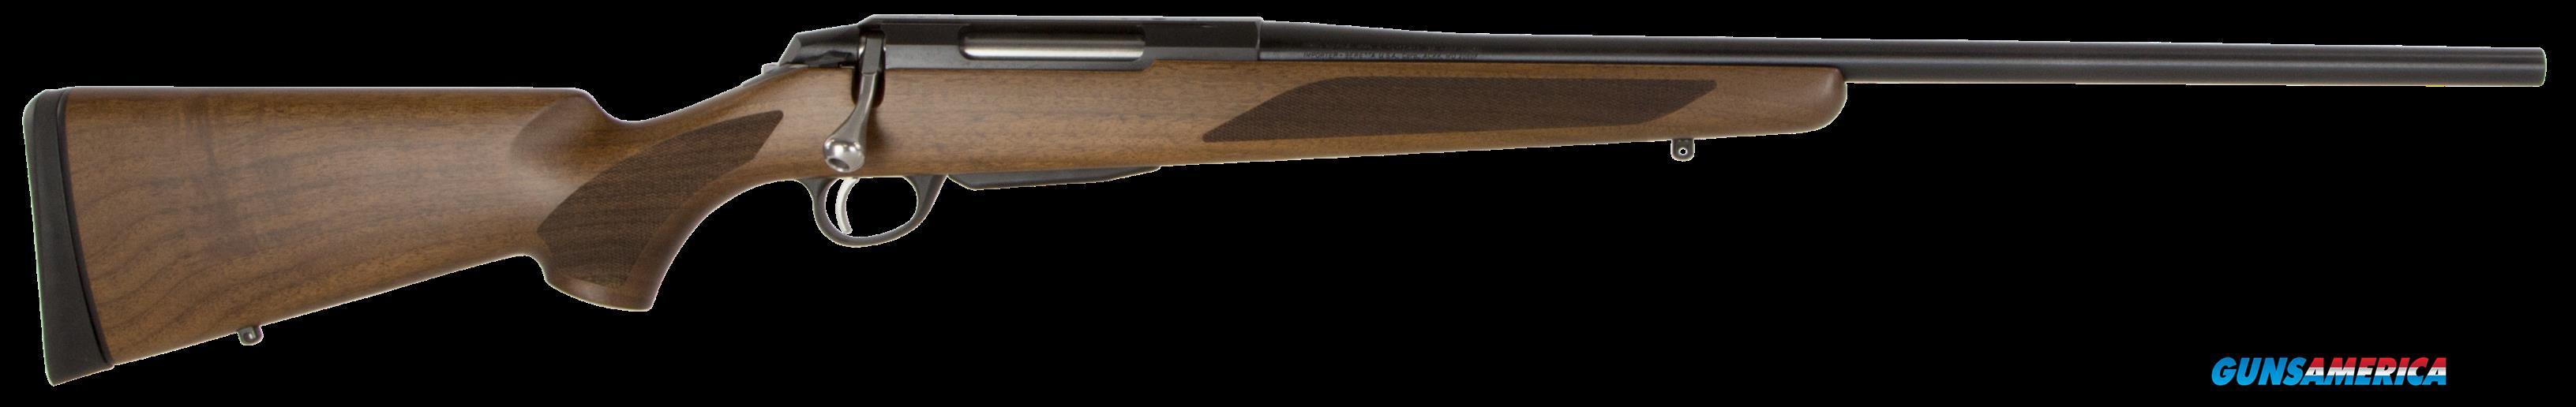 Tikka T3 T3x, Tikka Jrtxa331    T3x Hunter 300mg  Guns > Pistols > 1911 Pistol Copies (non-Colt)